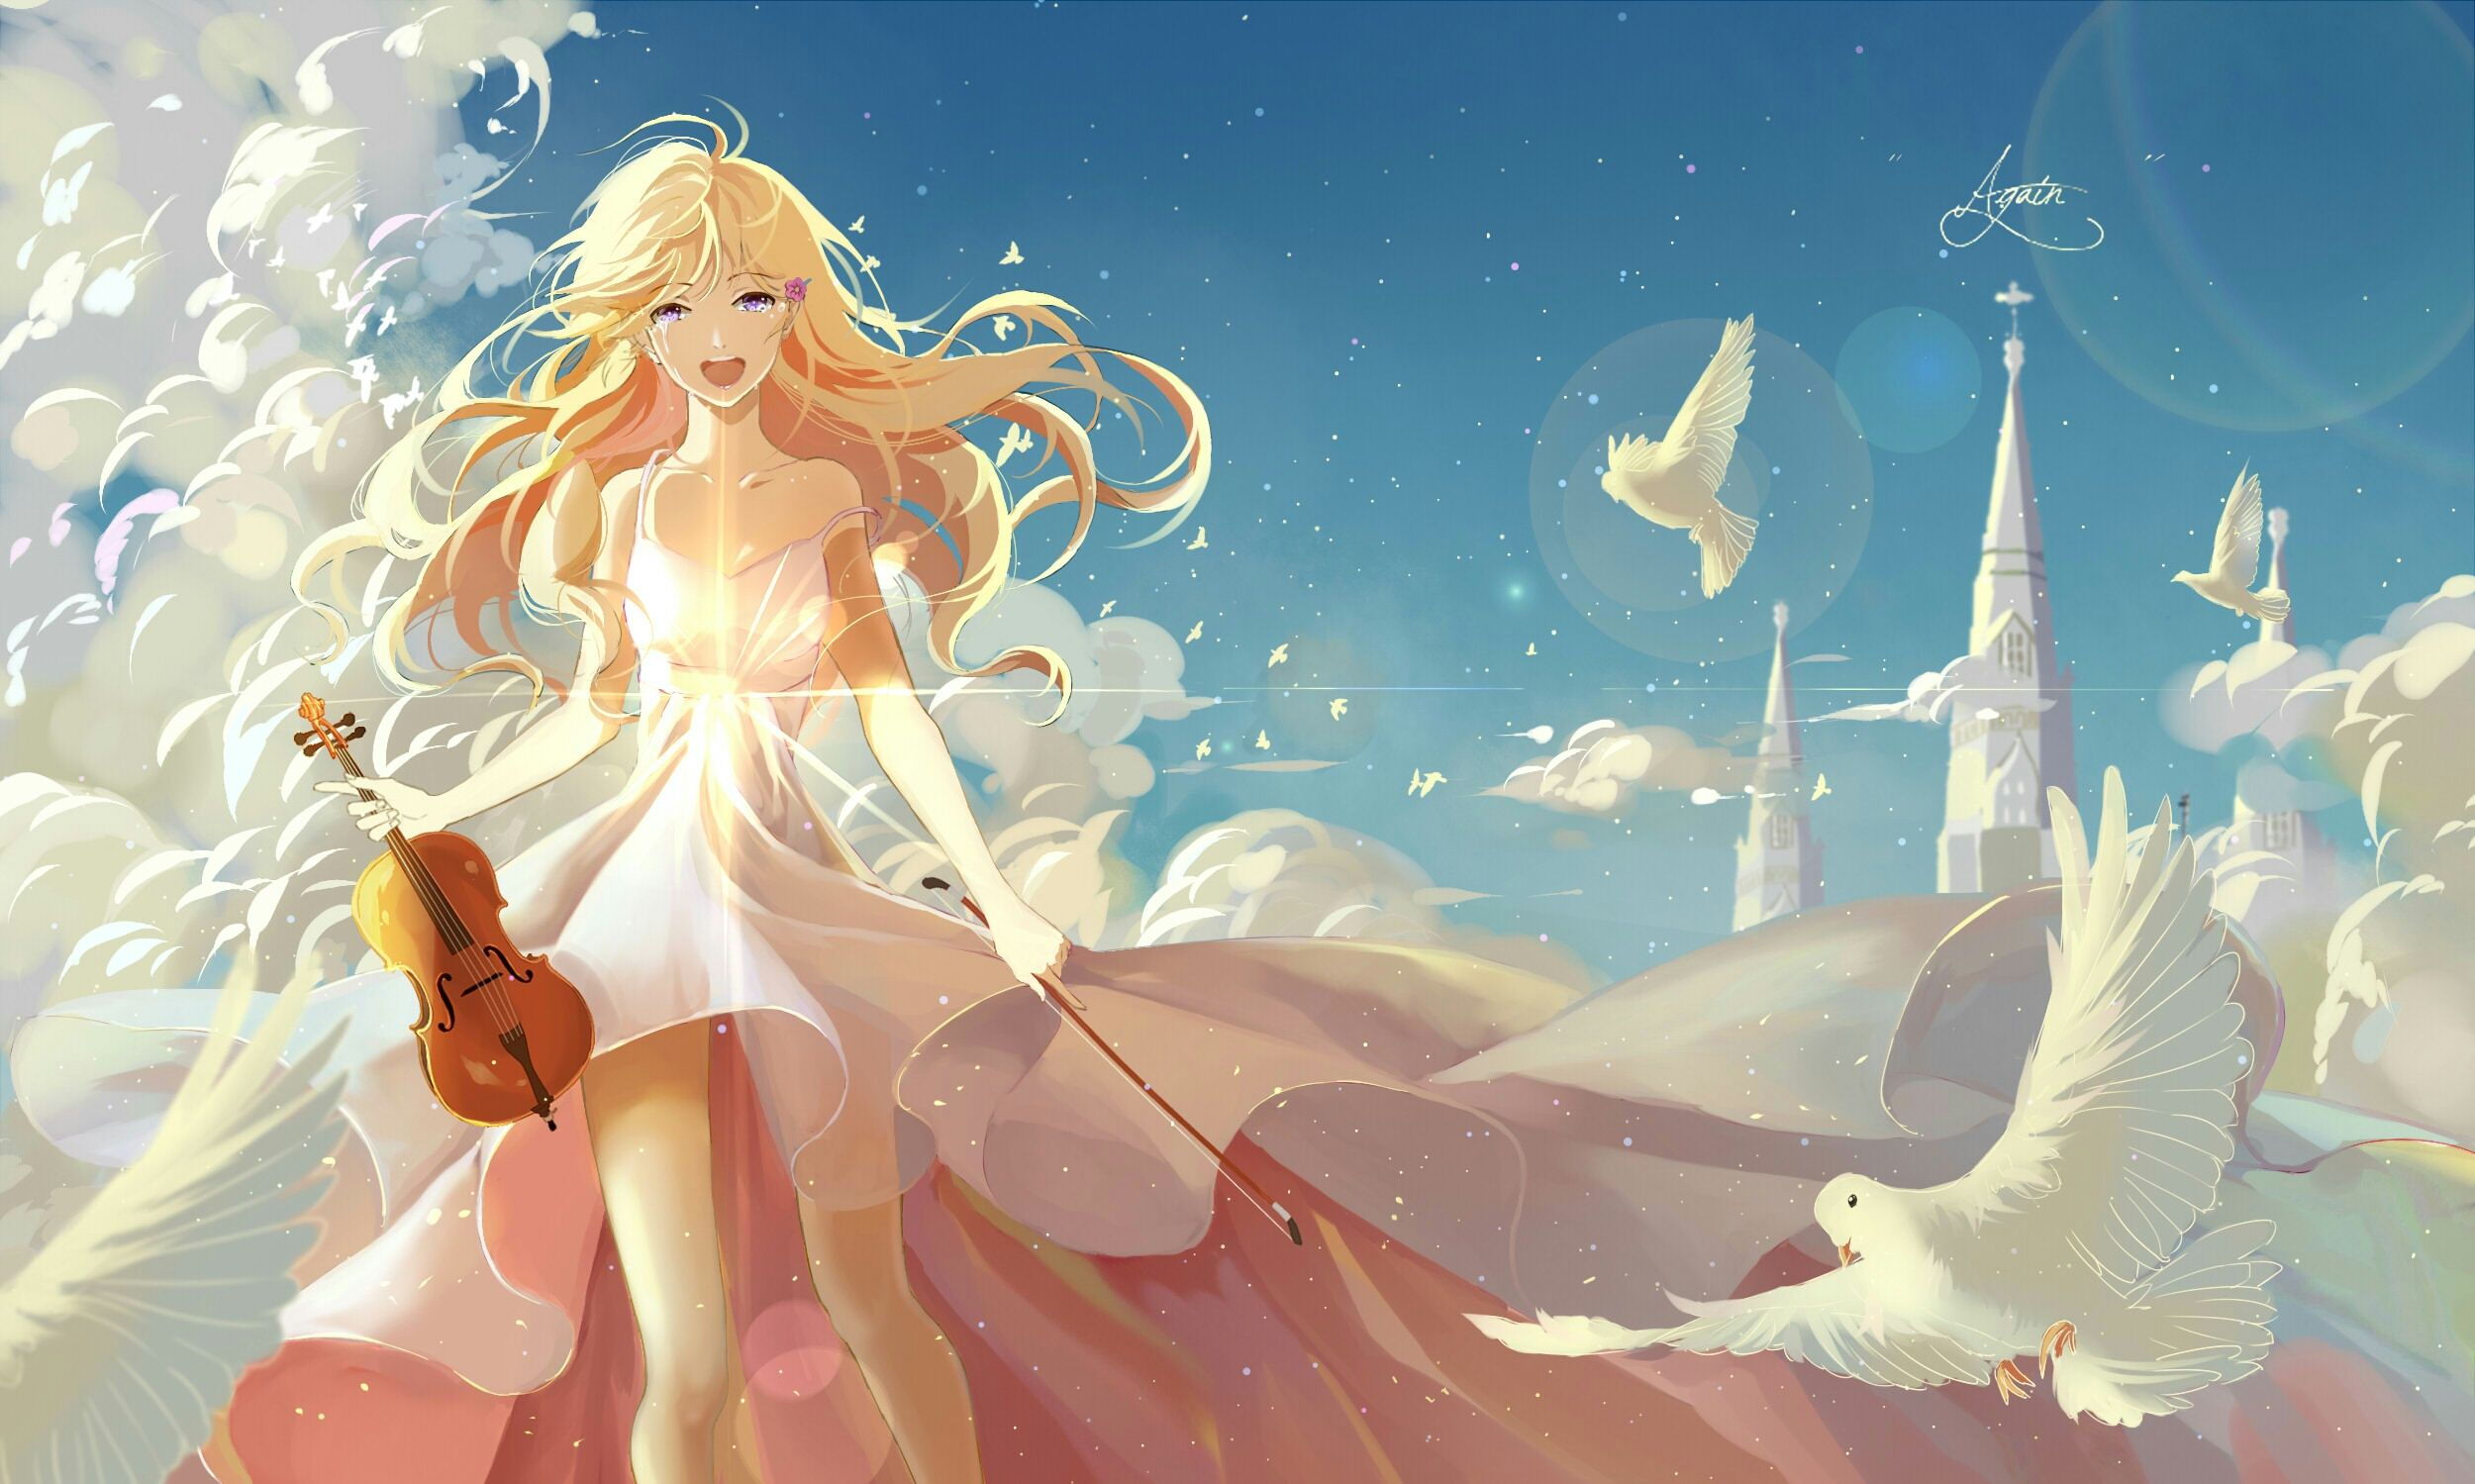 "Your Lie in April Kaori 36/"" x 24/"" Large Wall Poster Print Anime Manga"